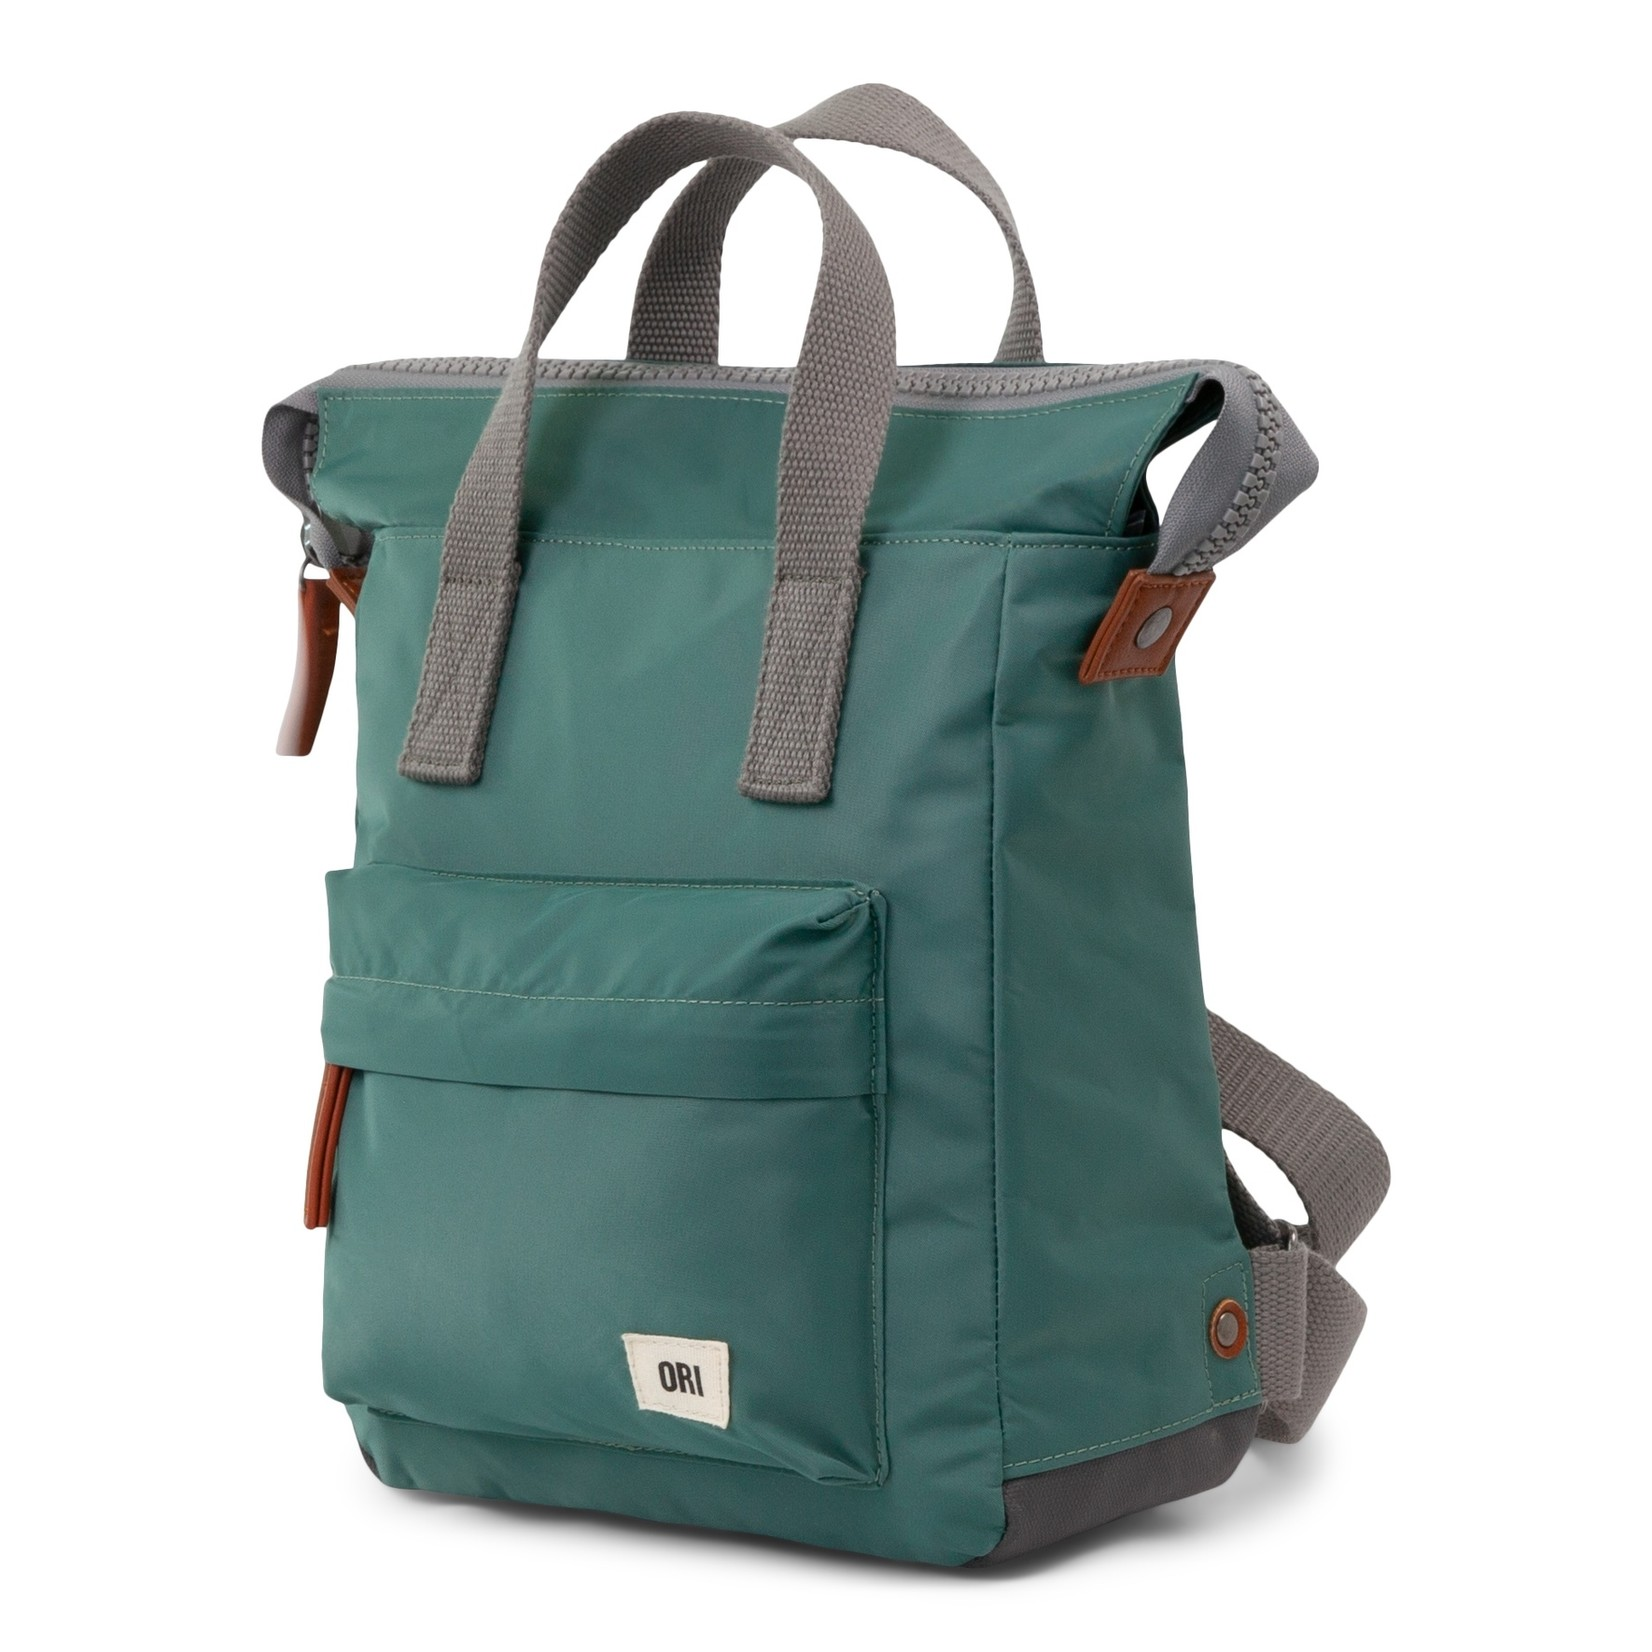 Ori London Bantry B Small Backpack Sage